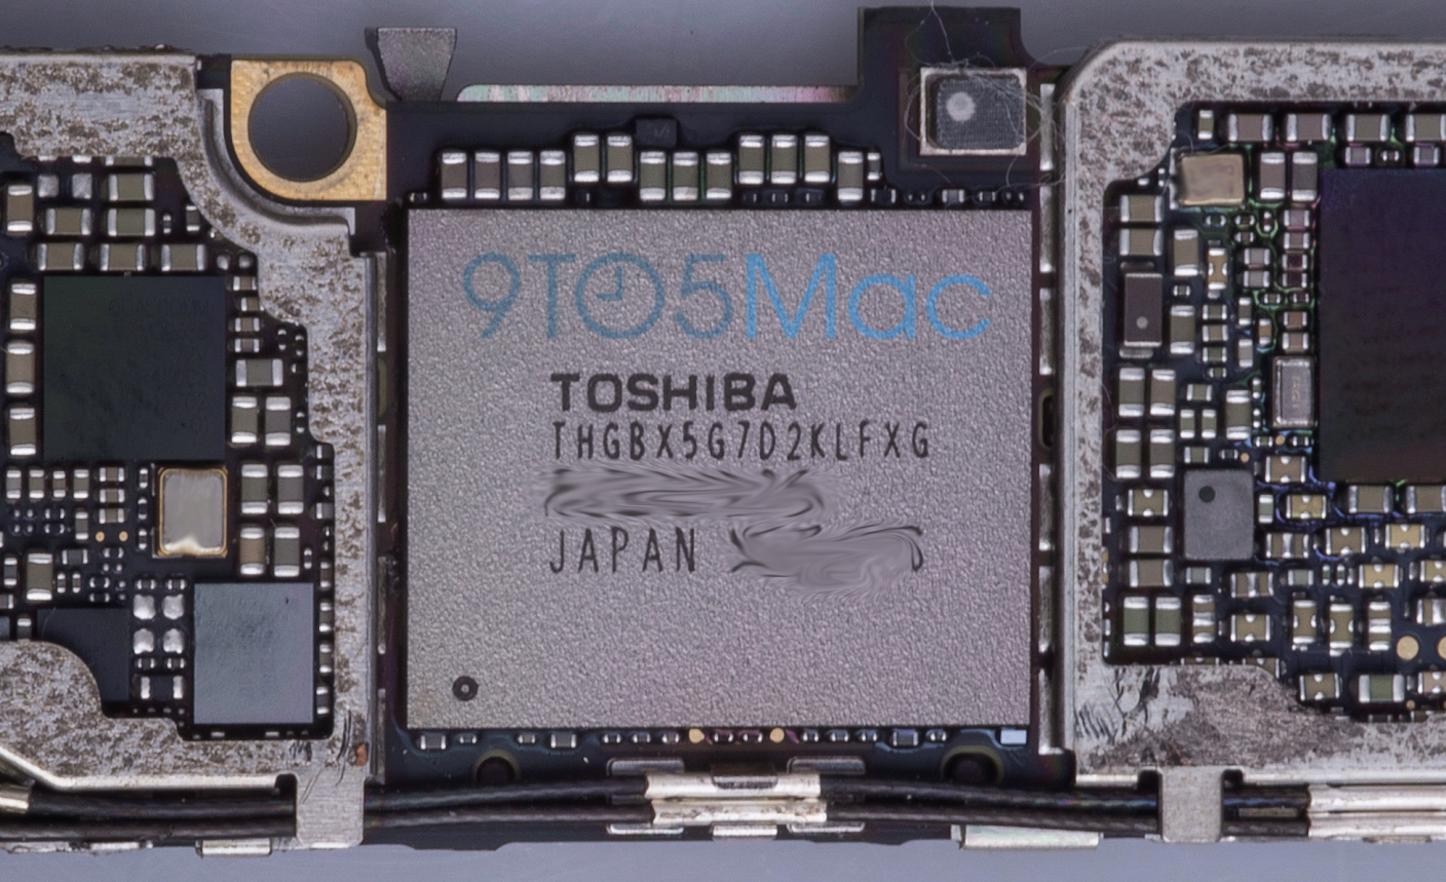 Toshiba-Storage-Chip-9To5Mac.png